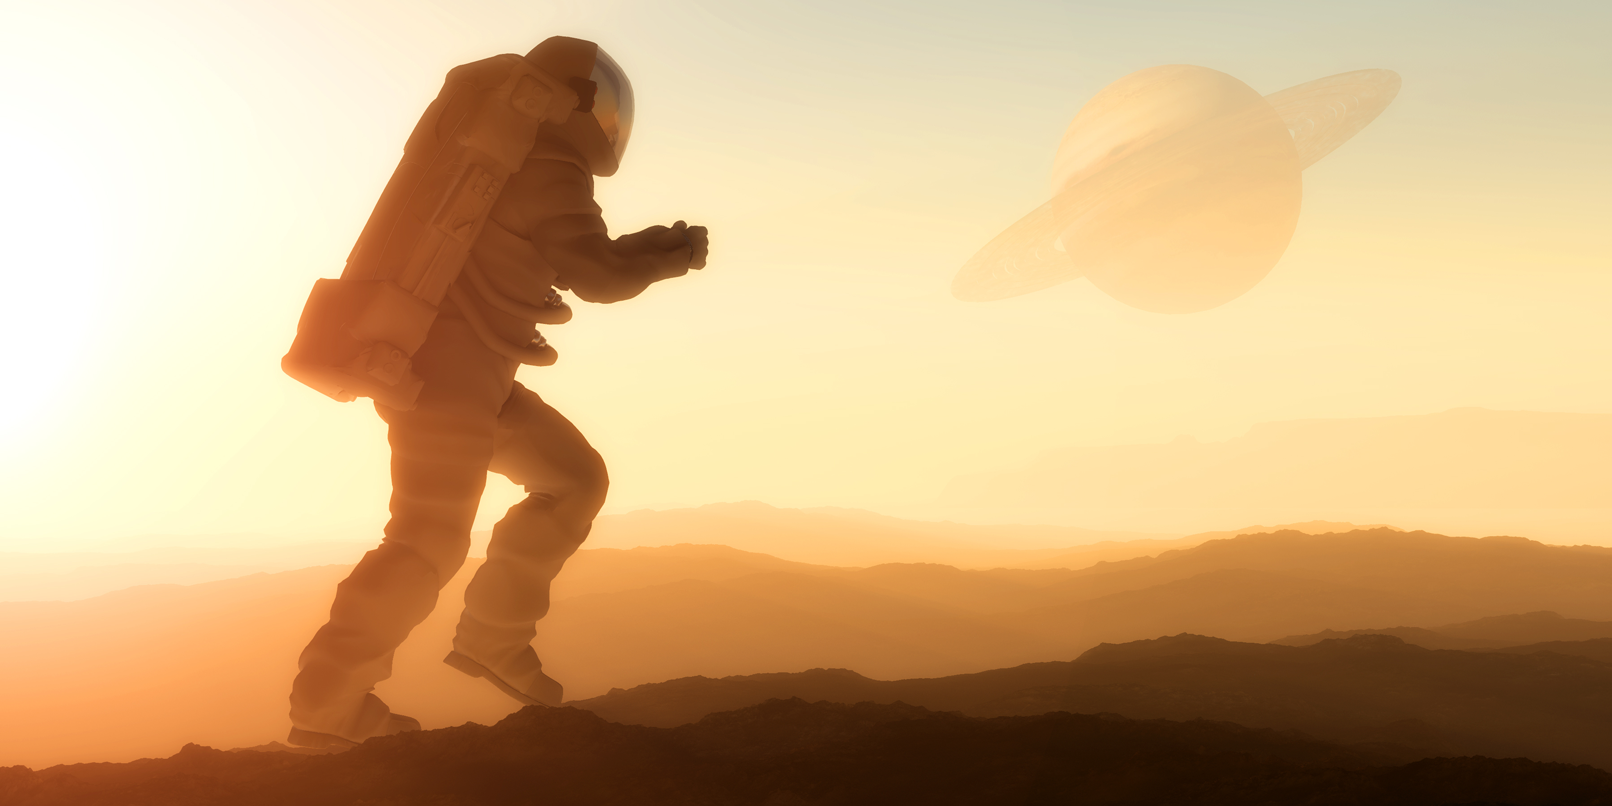 mars one astronaut applicants - photo #44